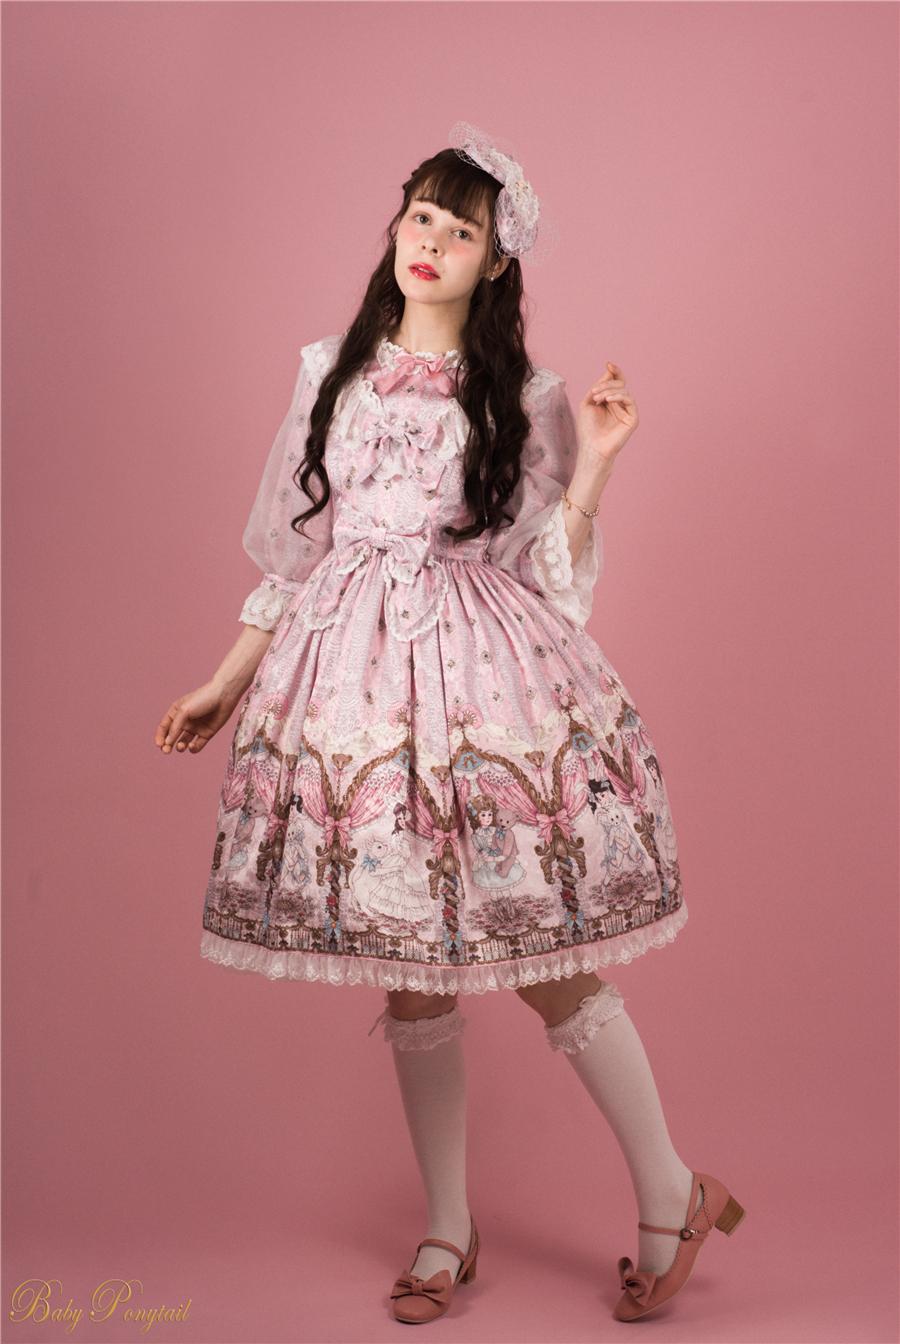 BabyPonytail_Model Photo_My Favorite Companion_OP Pink_0.jpg